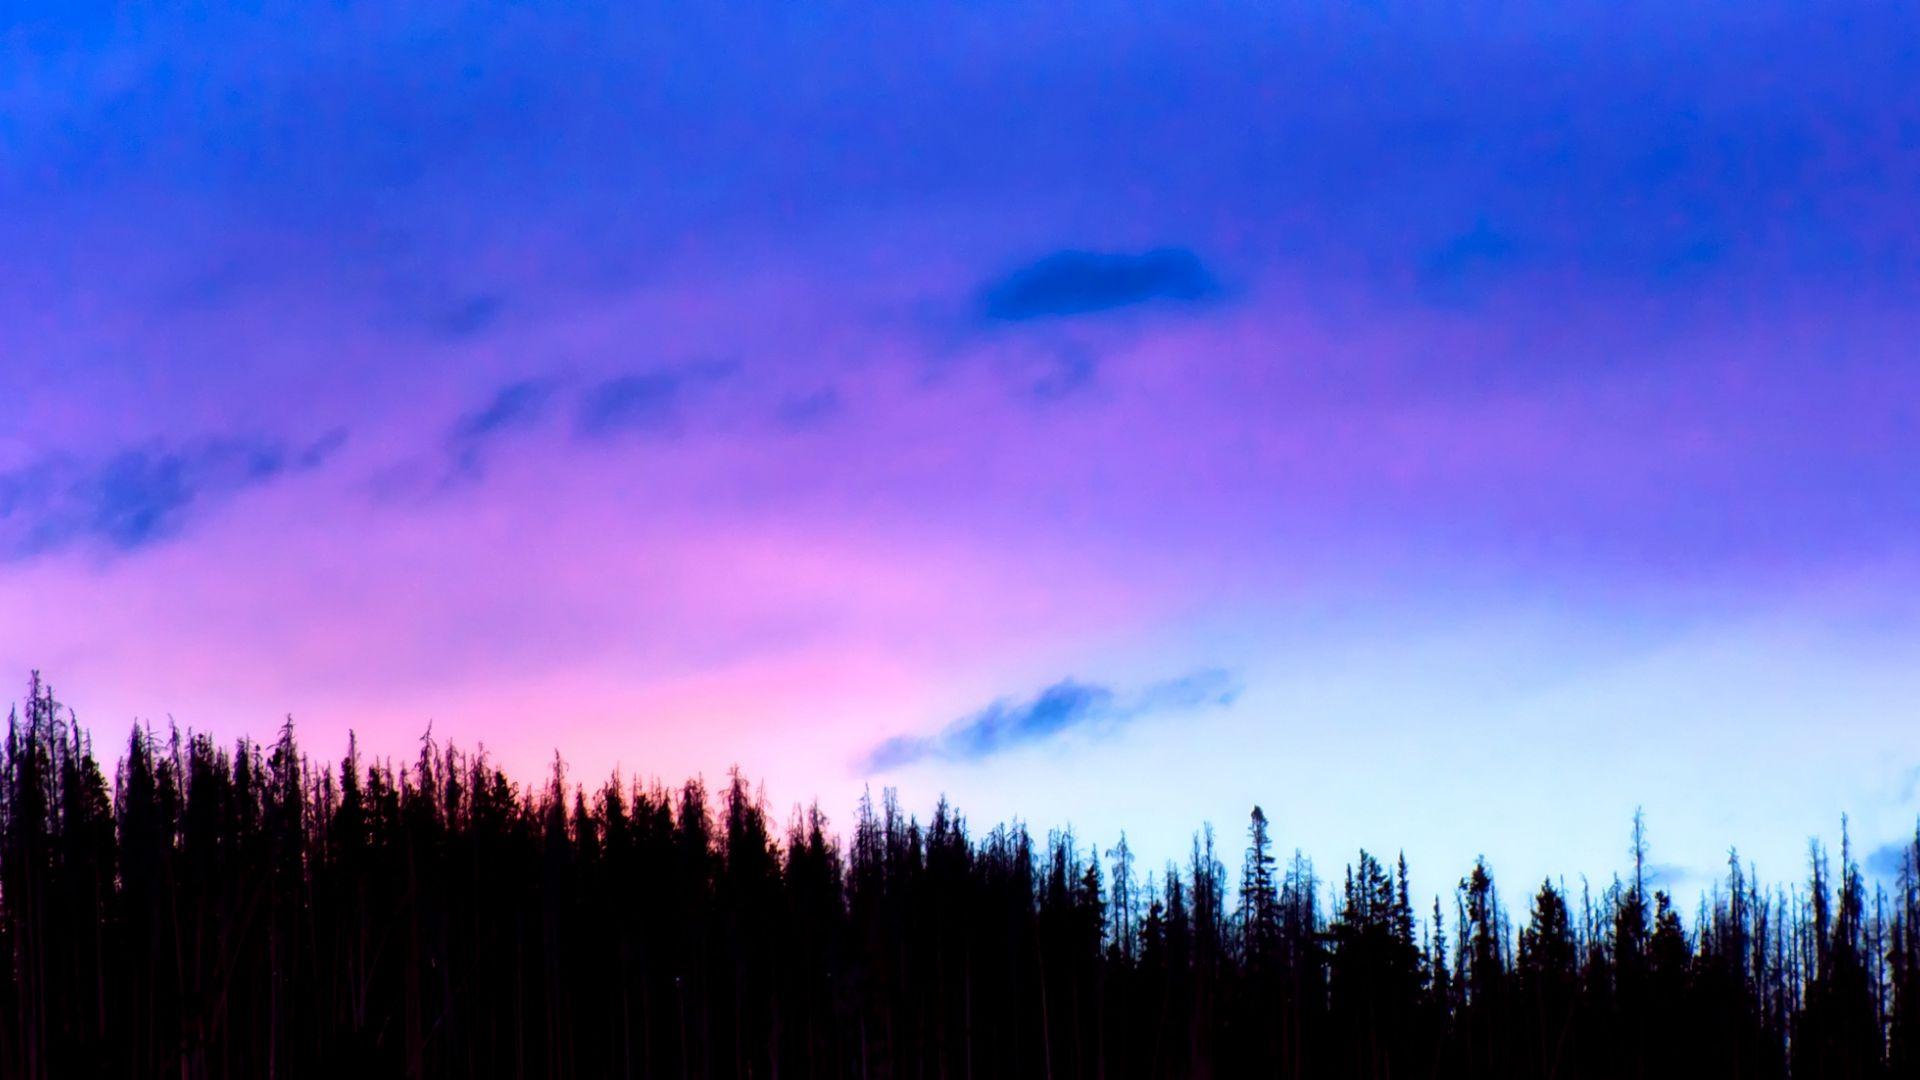 Wallpaper Sky, clouds, landscape, blue, nature